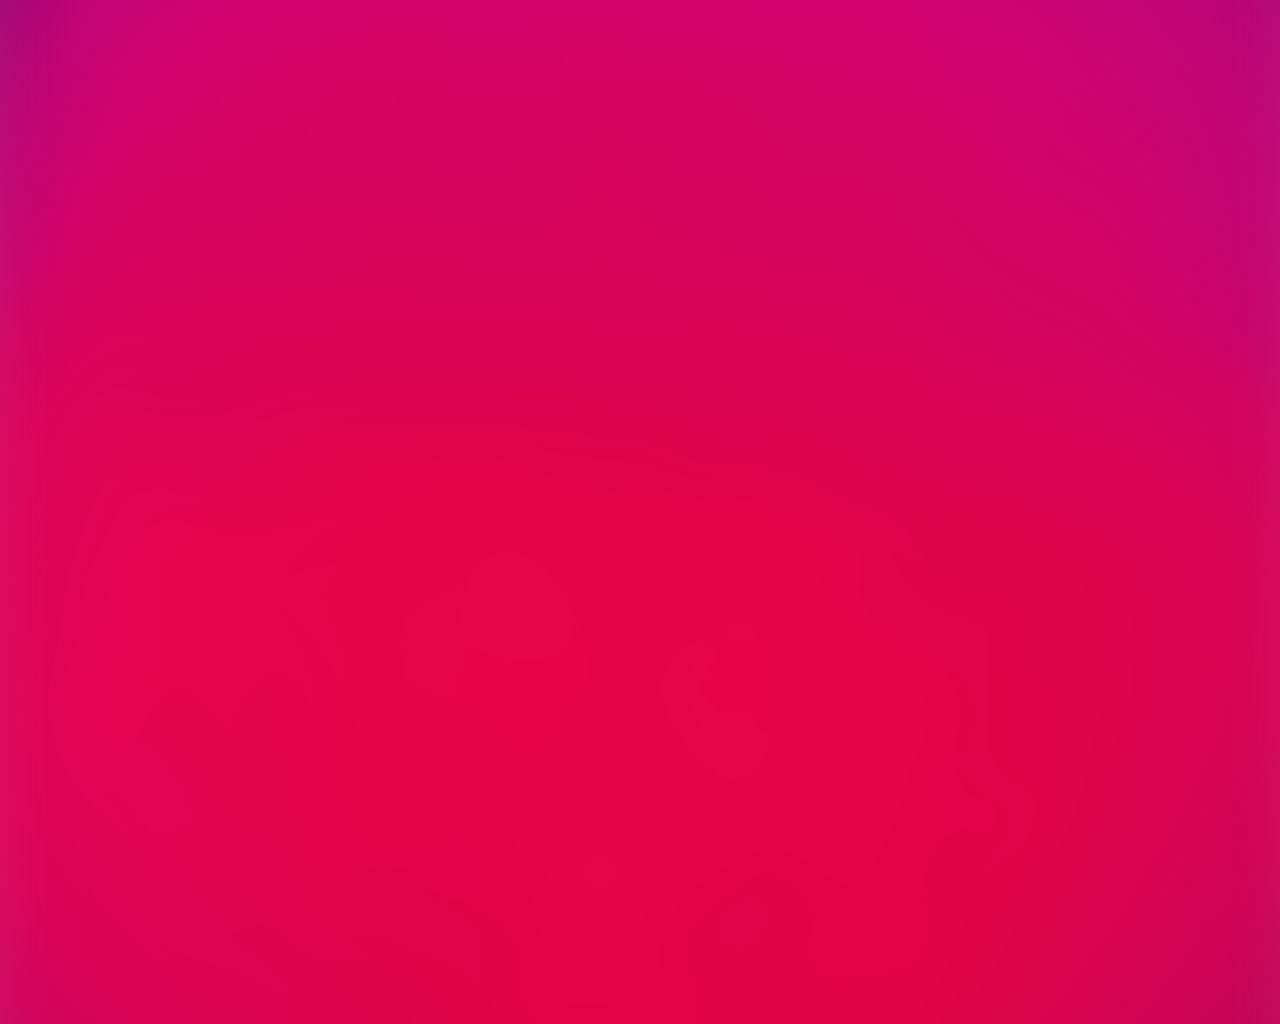 Hd Fall Mountain Wallpaper Sk19 Red Violet Hot Blur Gradation Wallpaper